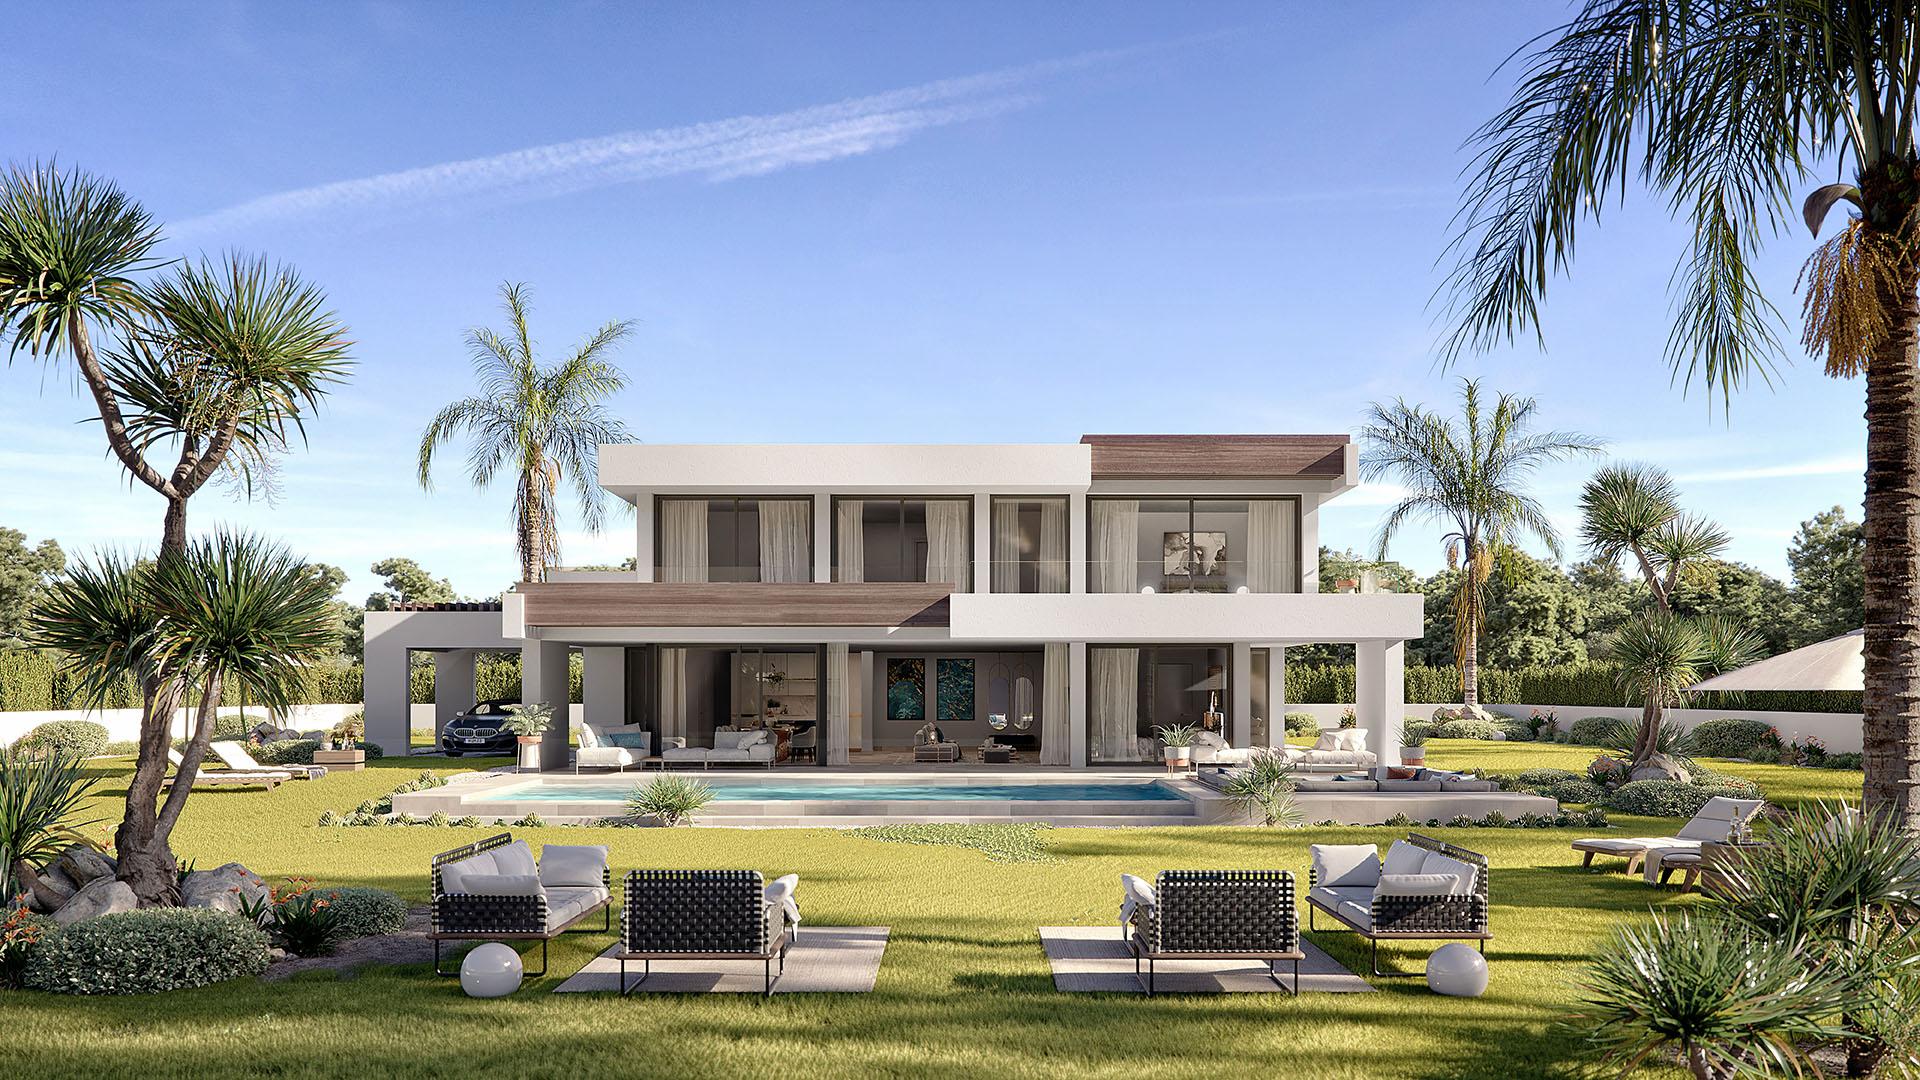 Oceanic: Magnificent new build villas with impressive sea views in Manilva